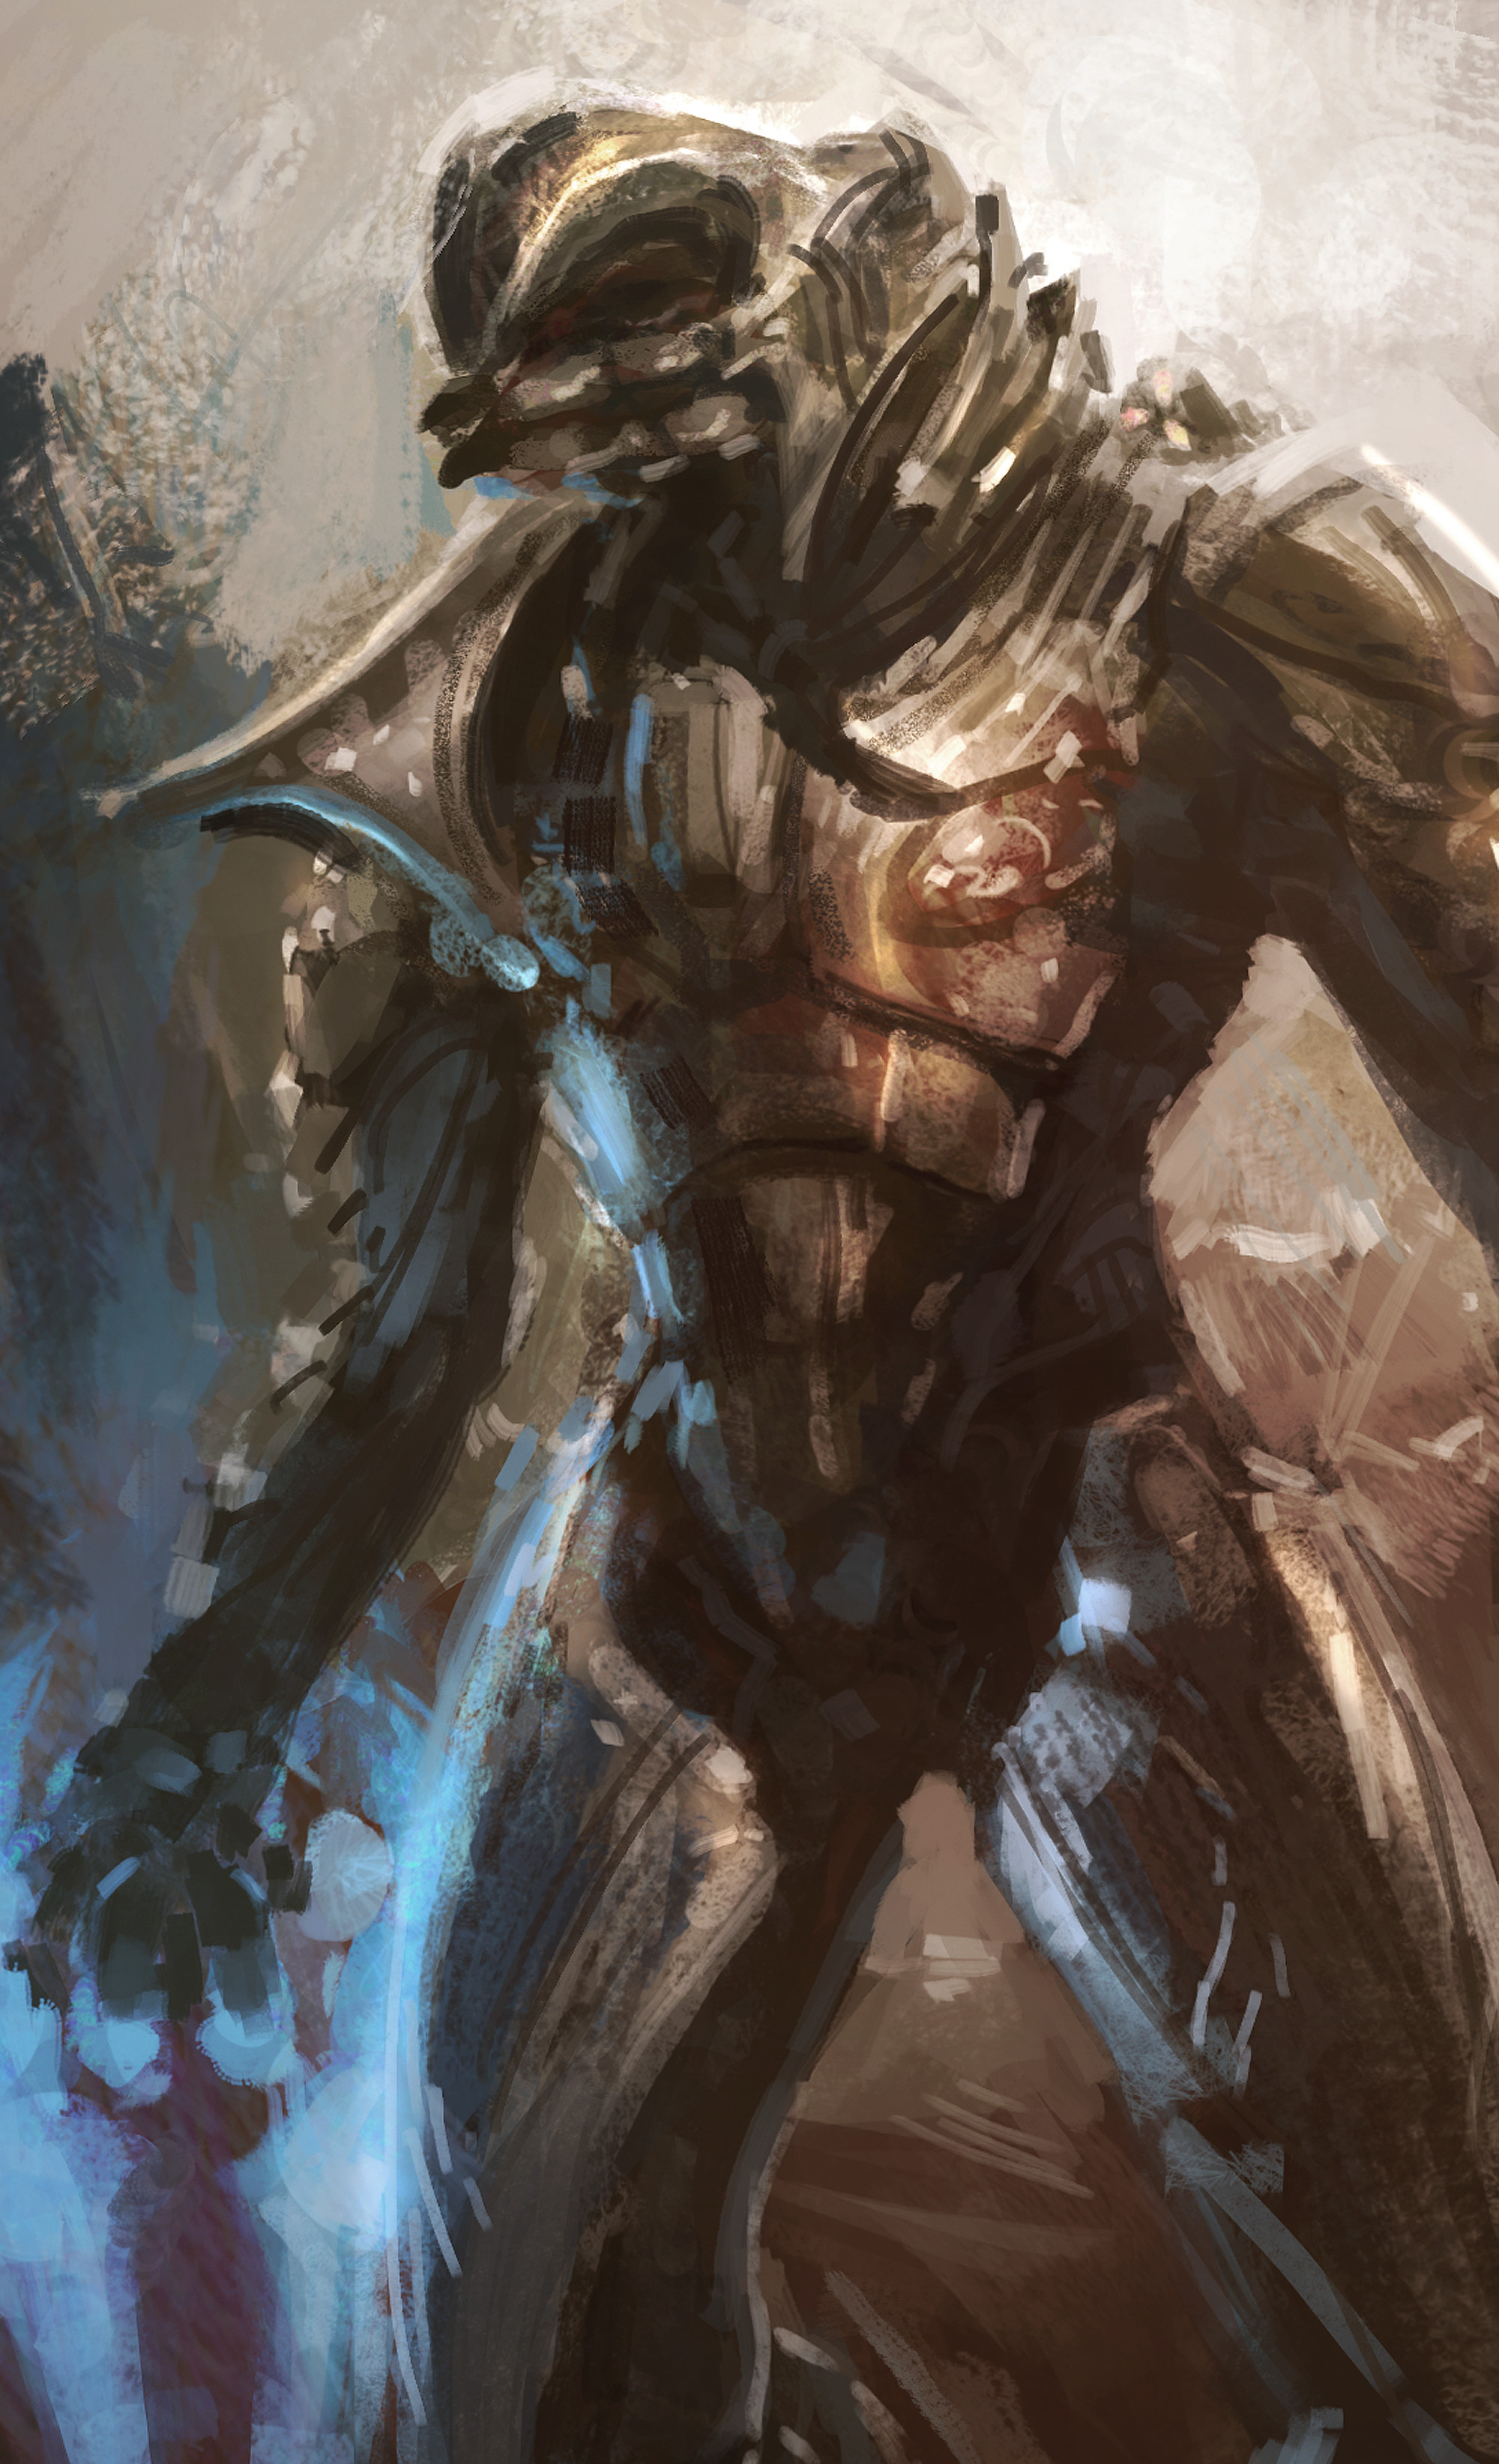 Halo 3 Arbiter Wallpaper 86 Images